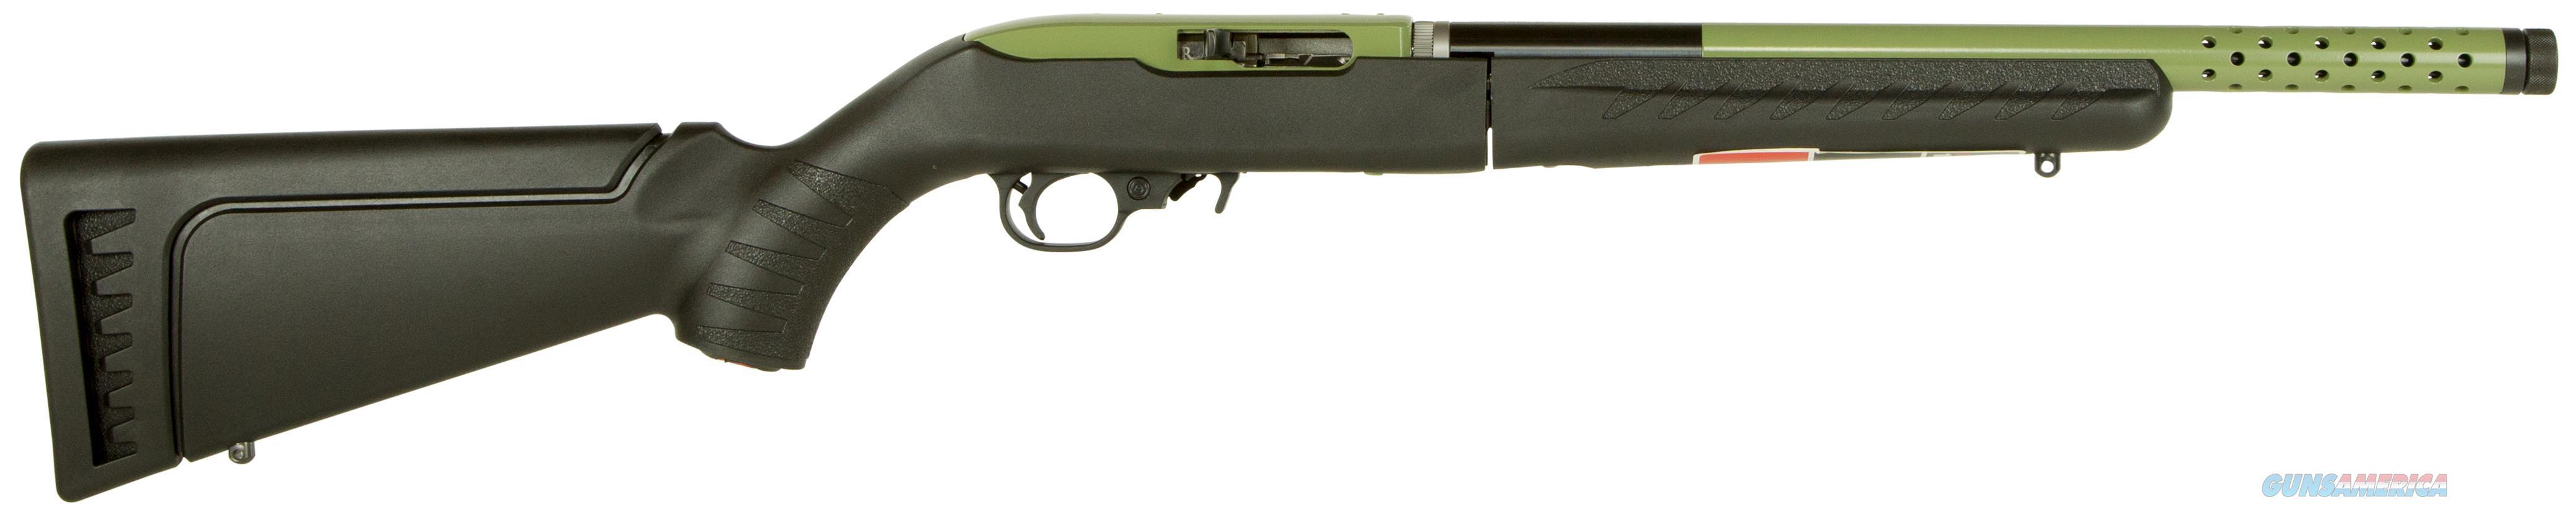 "Ruger 21155 10/22 Takedown Lite Semi-Automatic 22 Long Rifle (Lr) 16.1"" 10+1 Synthetic Black Stk Green 21155  Guns > Rifles > R Misc Rifles"